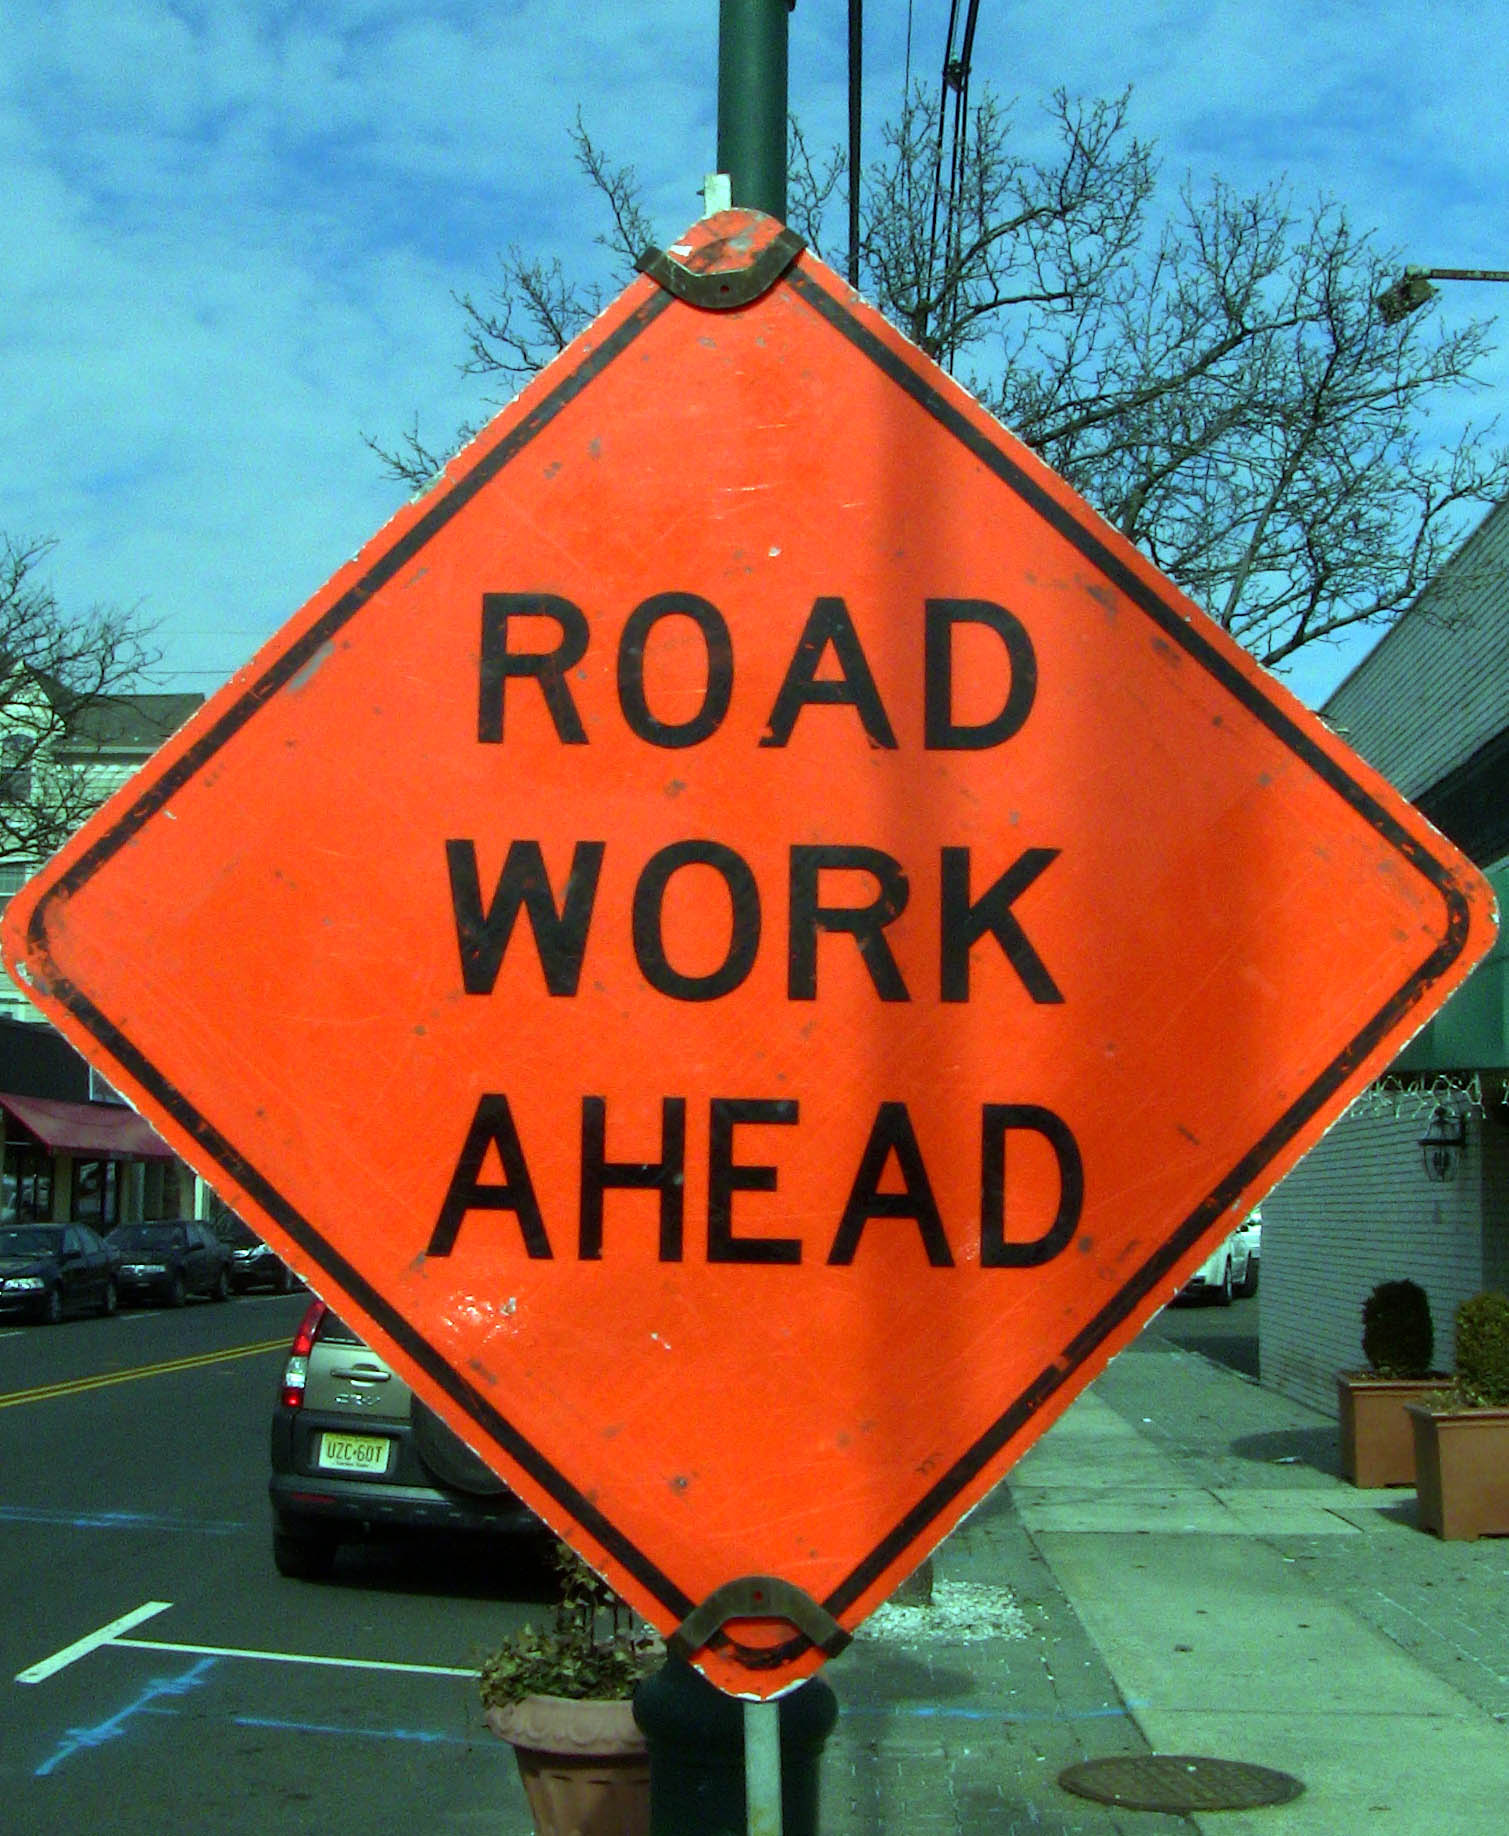 d3c4b7574fc9131be945_Road_Work_Ahead_sign.jpg